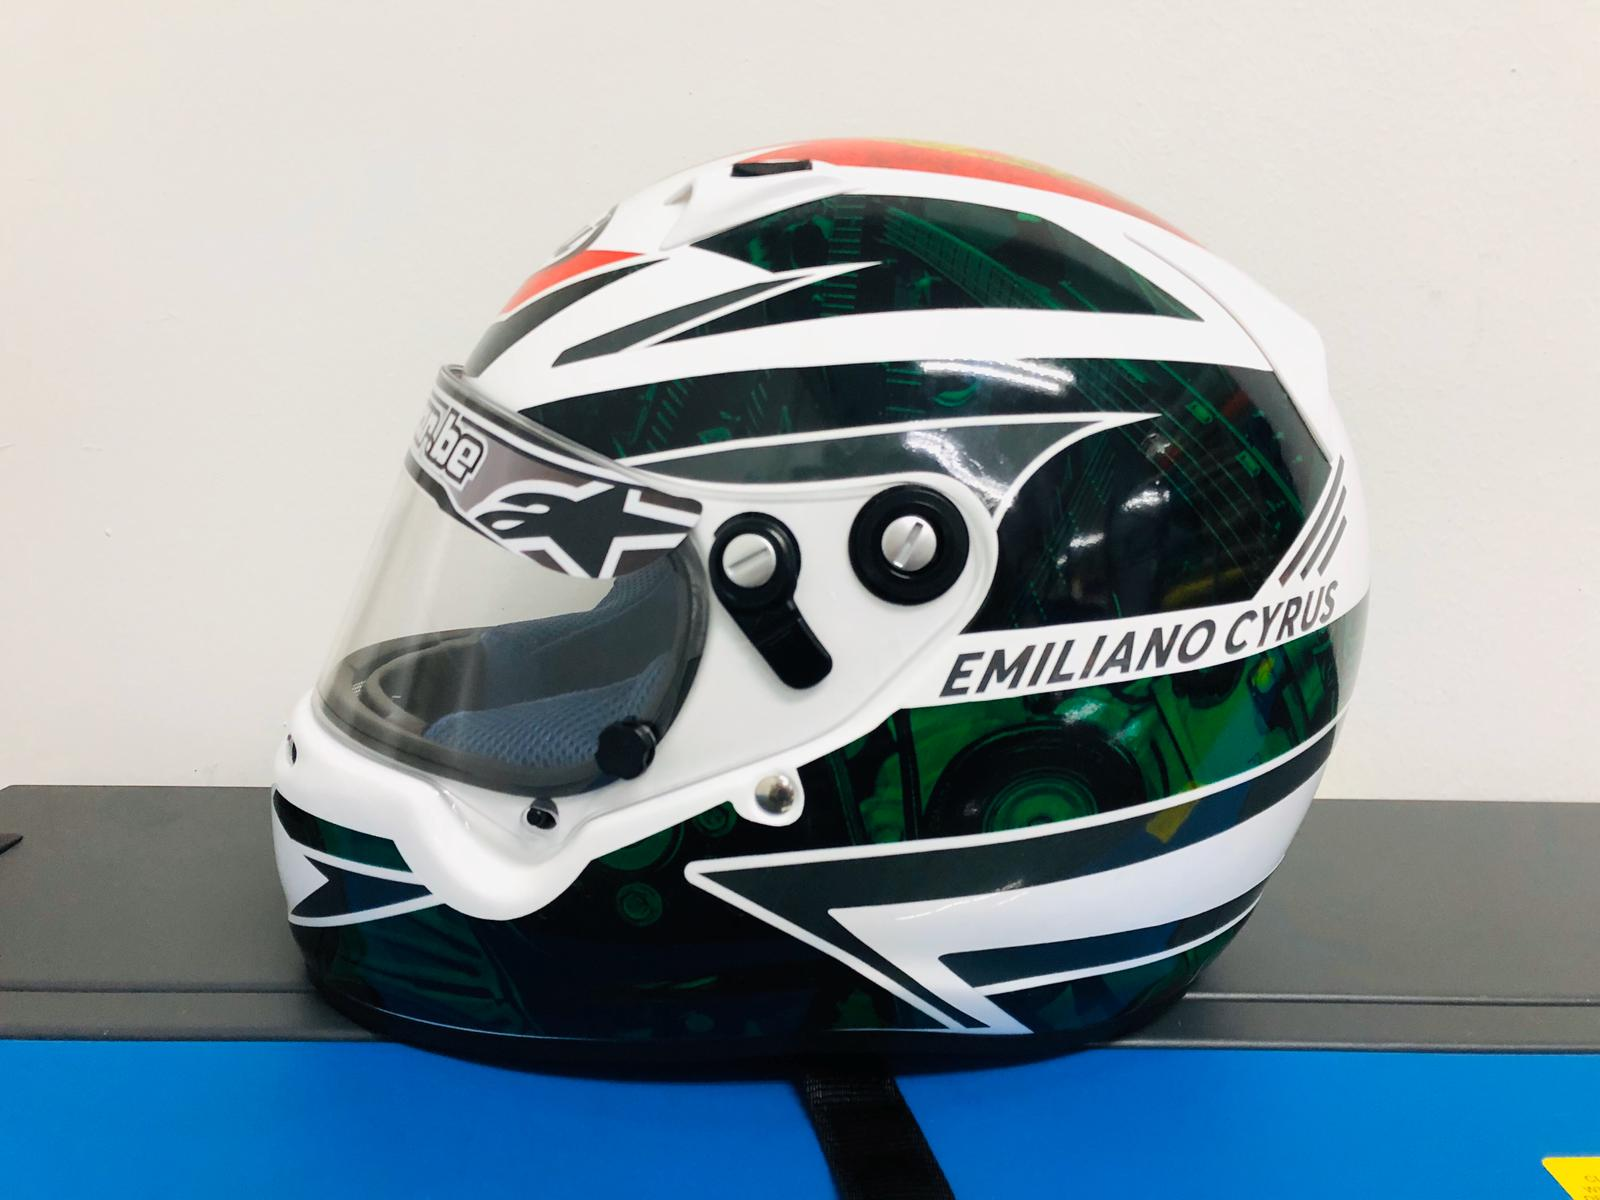 Arai Helmet Custom Decals With Emiliano Cyrus Name on it